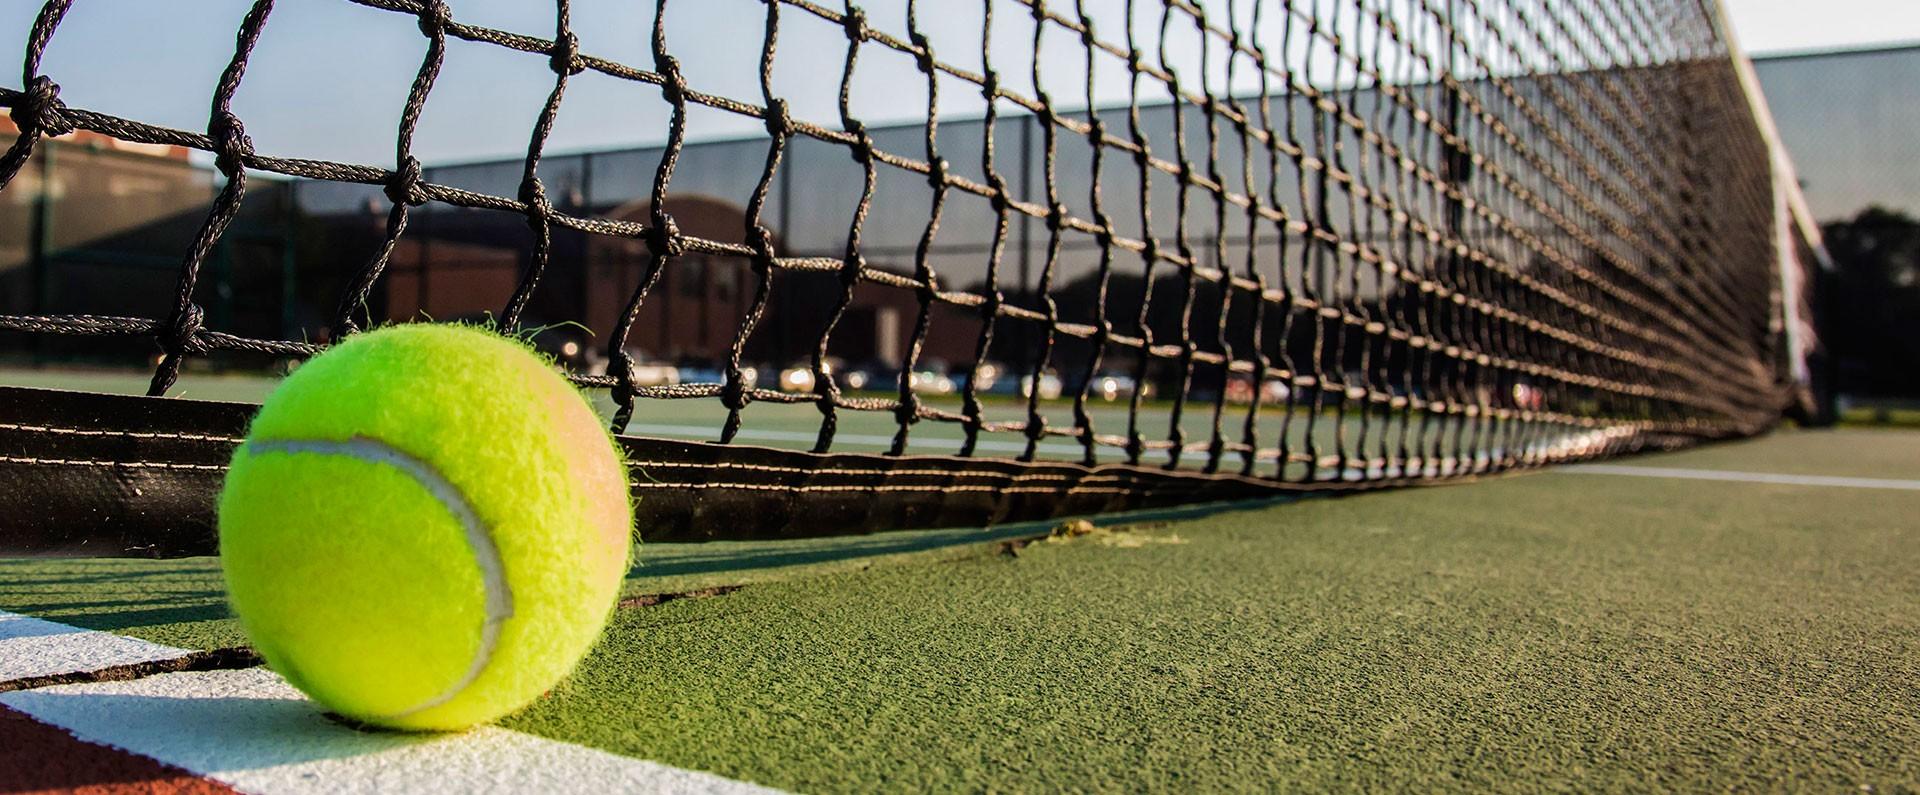 Тай-брейк в теннисе